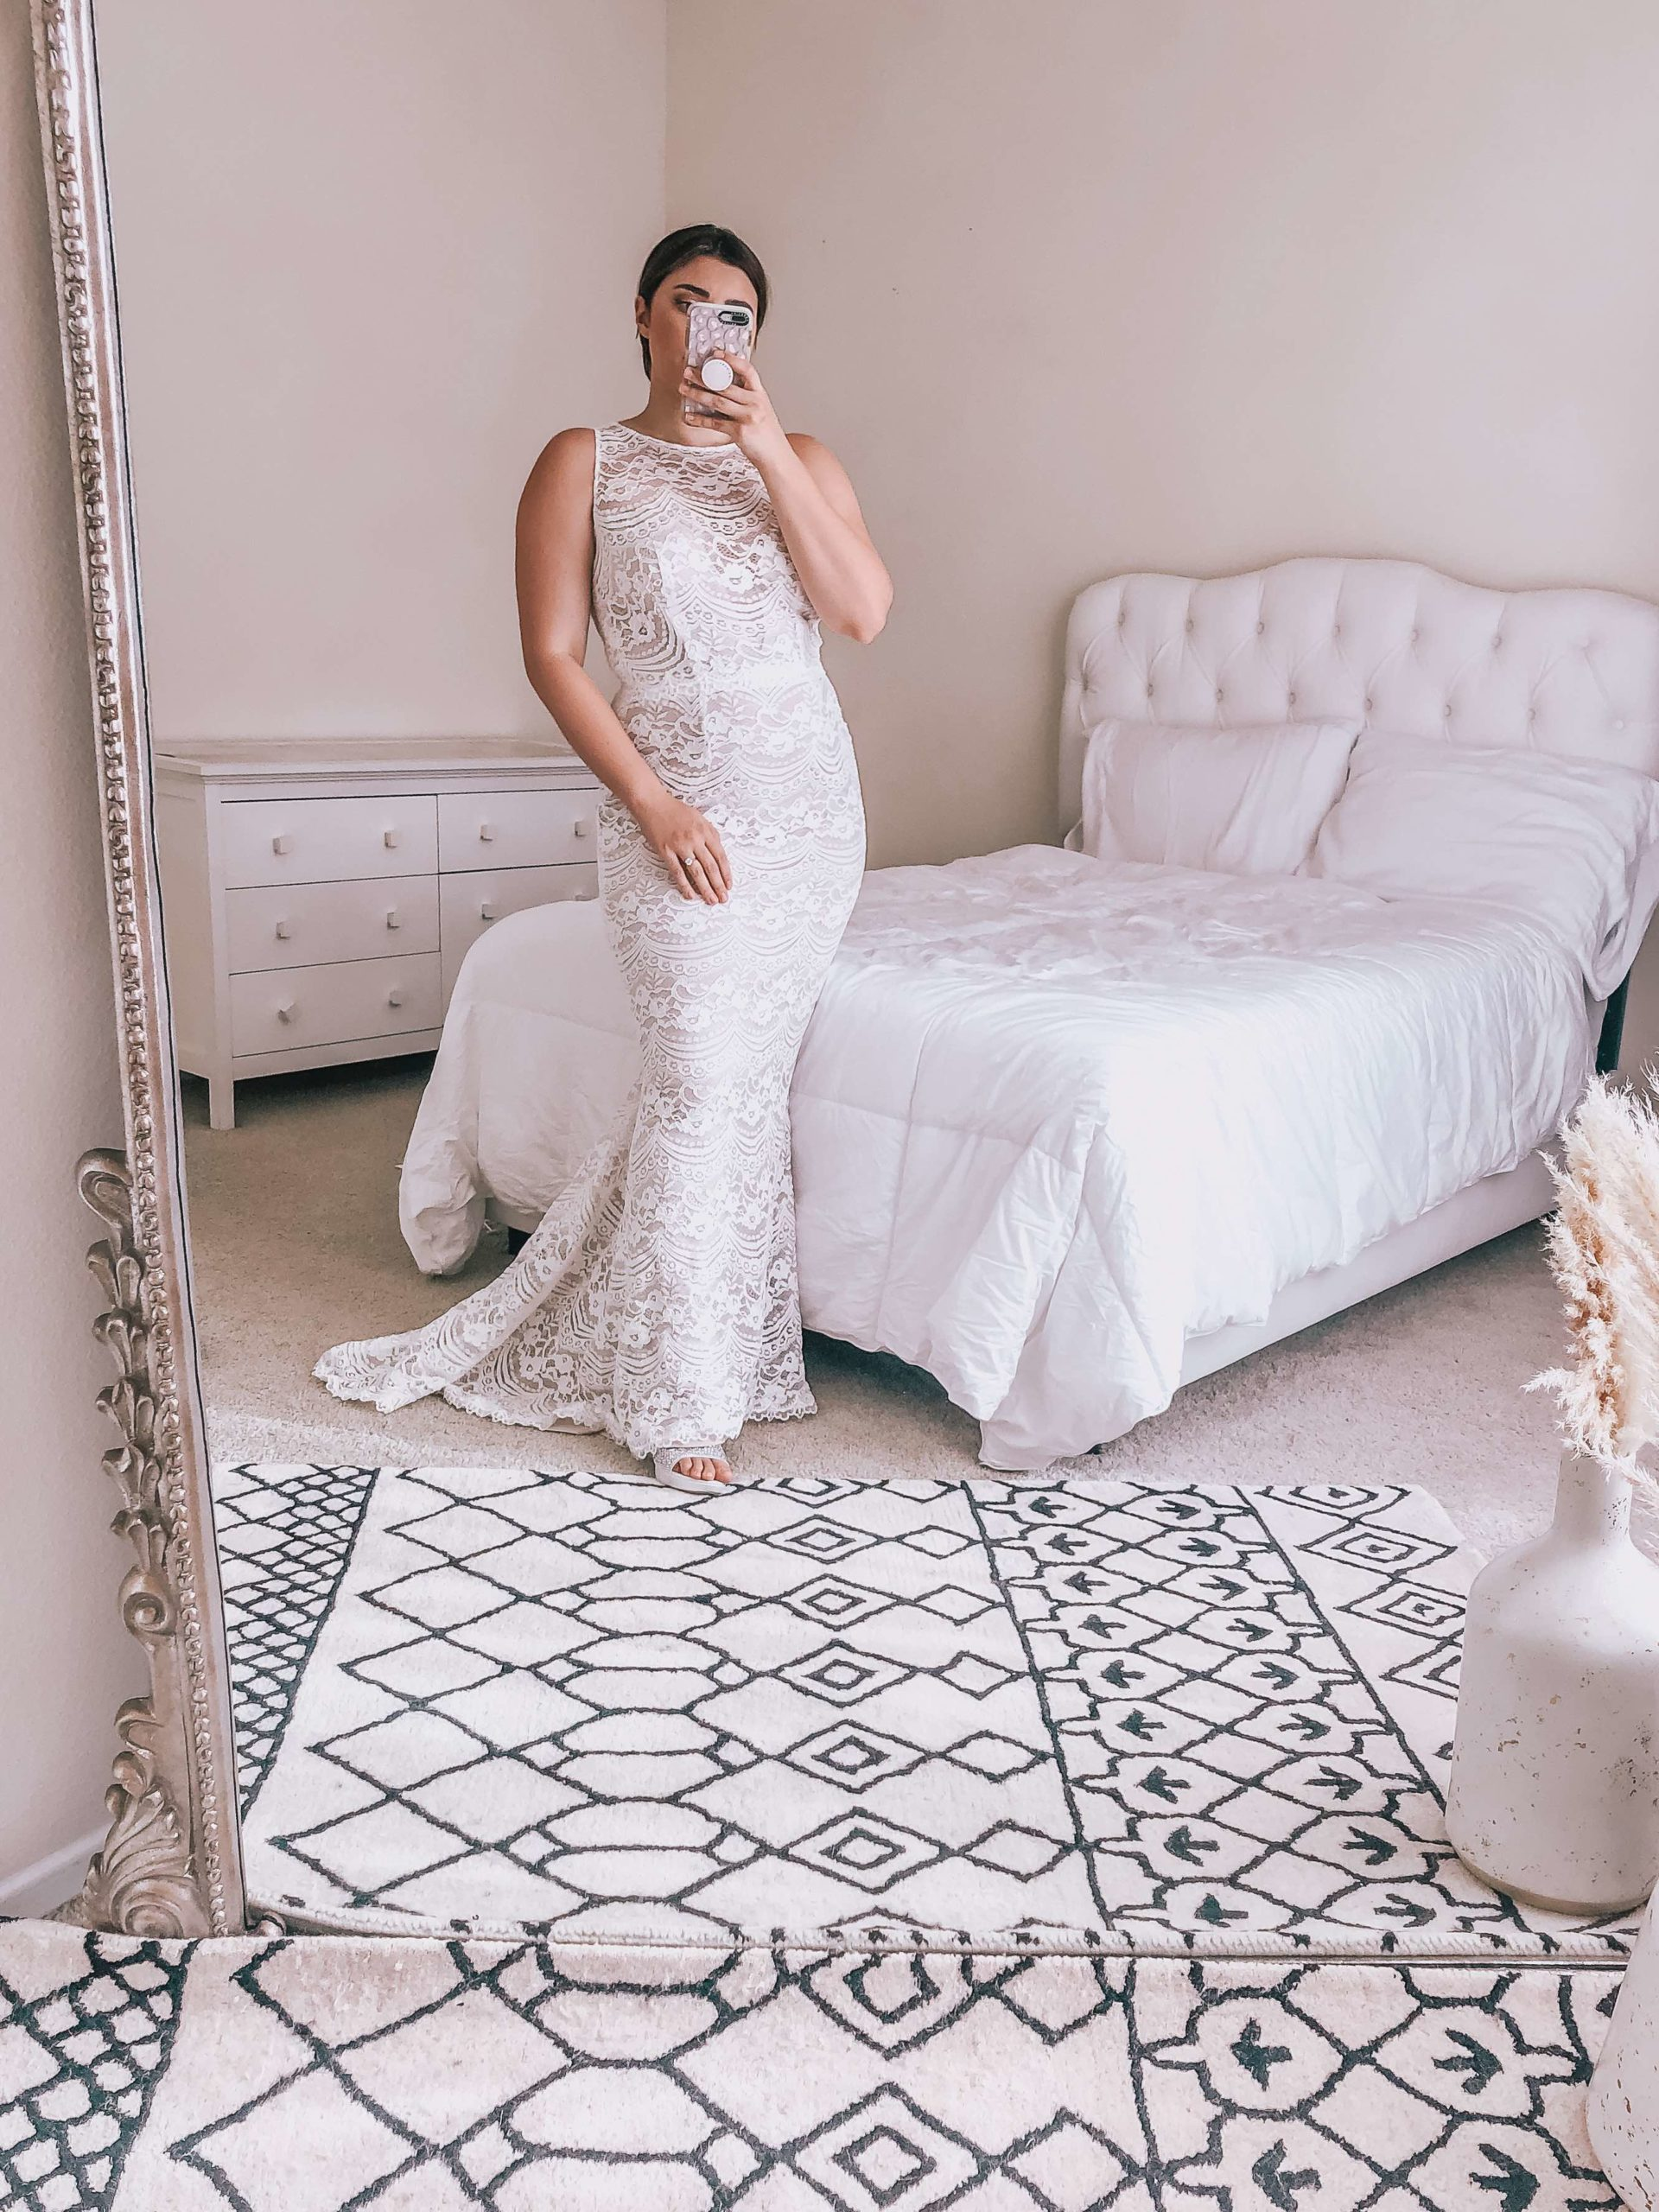 Influencer @katie_lavieri taking a mirror selfie in style MS251214